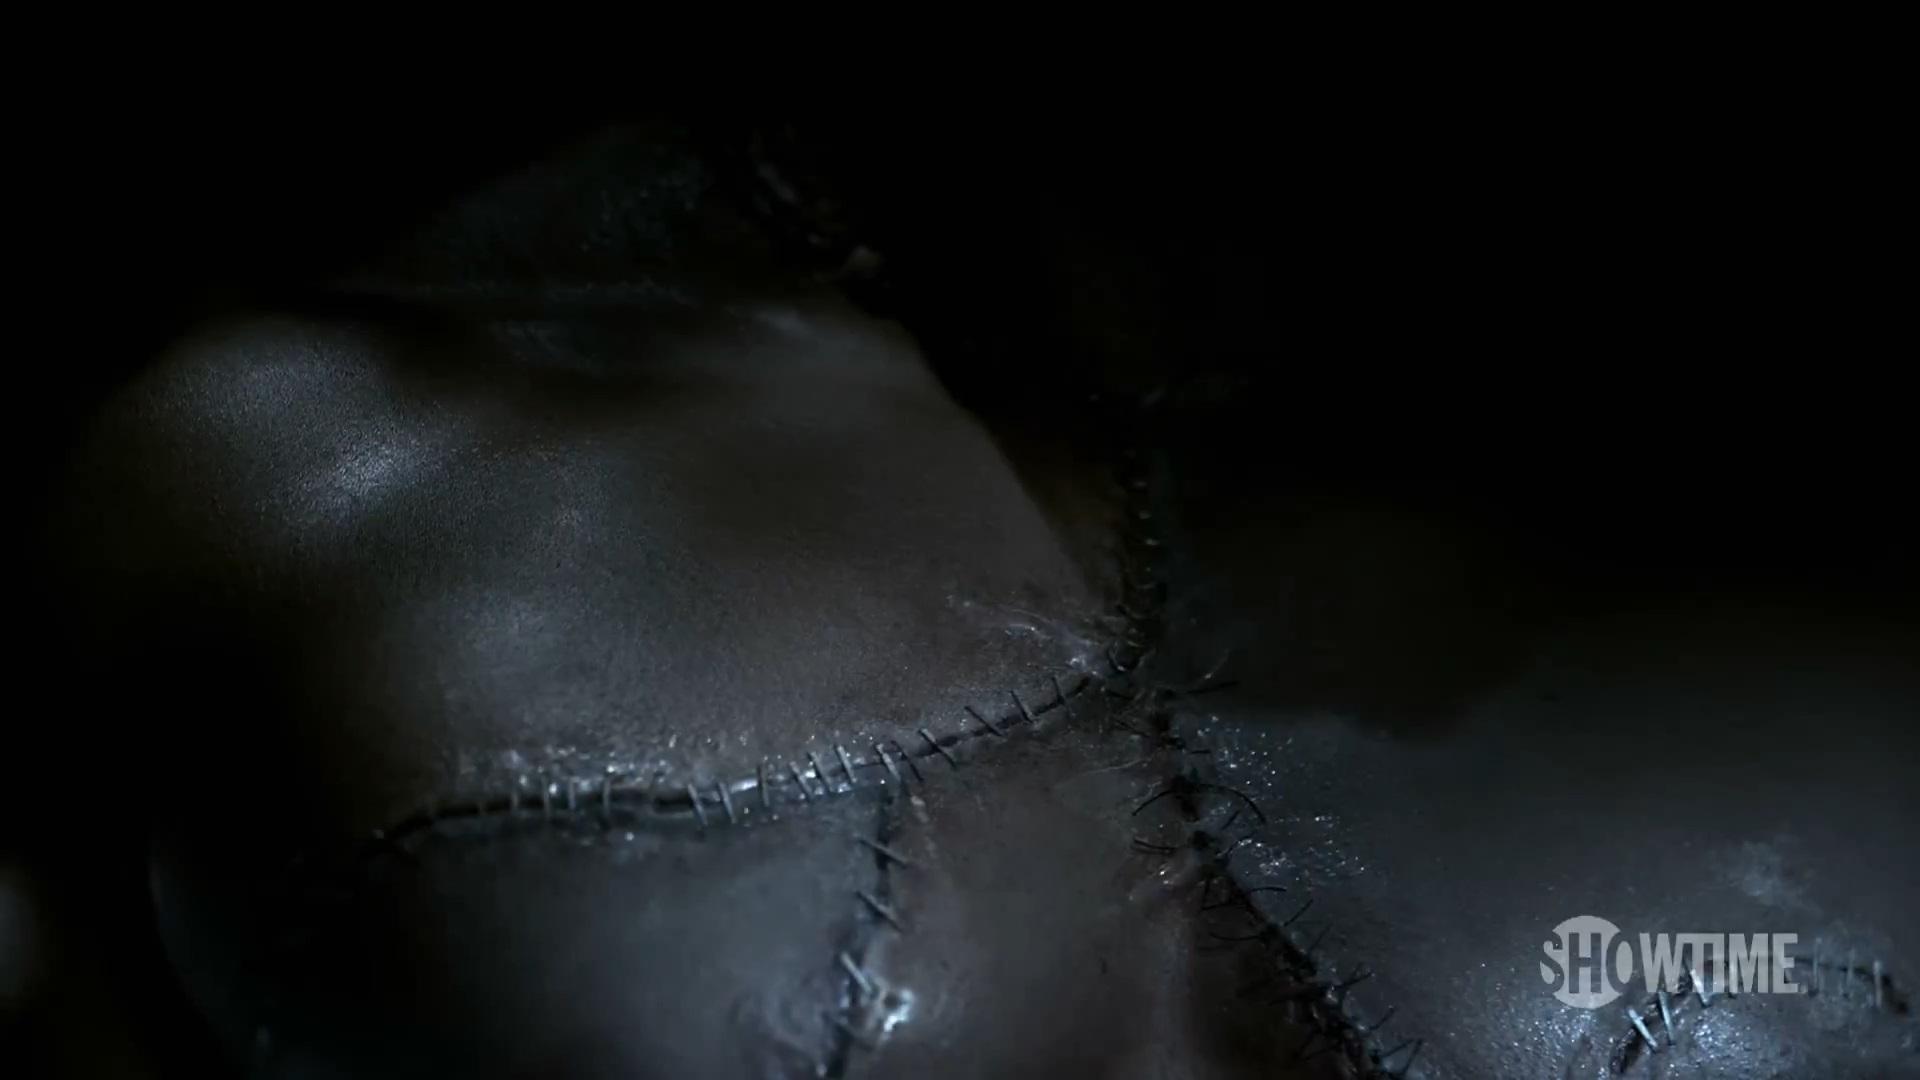 Penny Dreadful – ny psykoseksuel horrorserie på vej